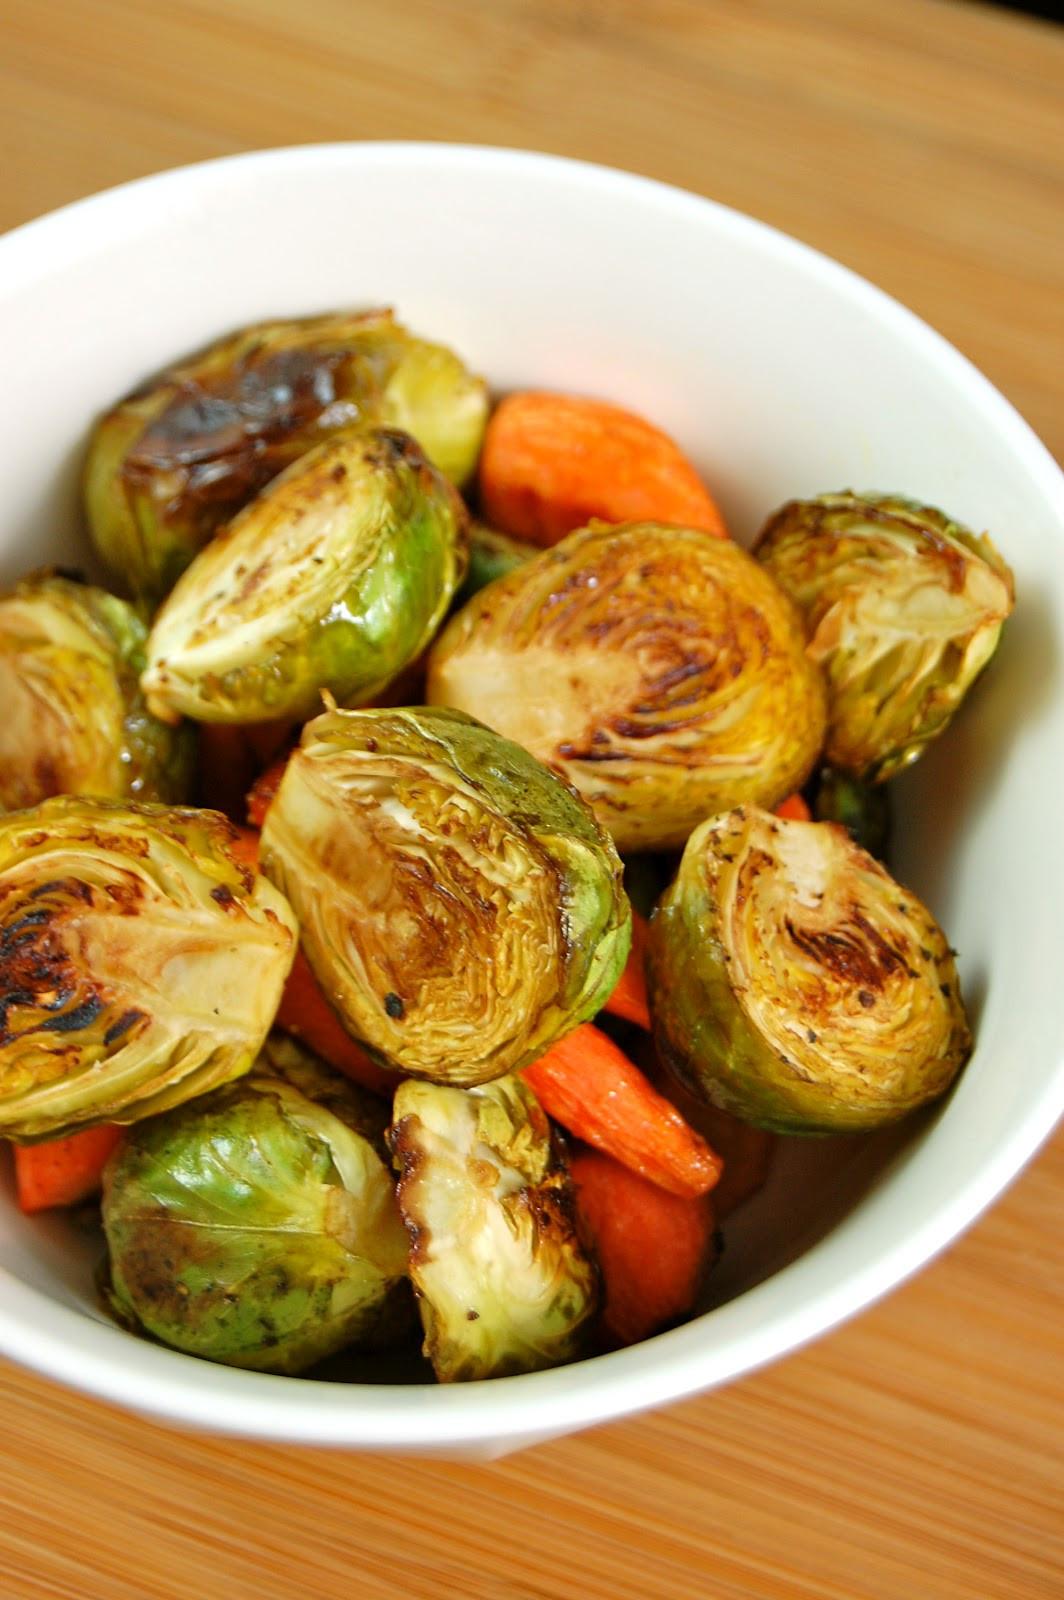 Balsamic Roasted Vegetables  La Petite Maison Verte Balsamic Roasted Ve ables